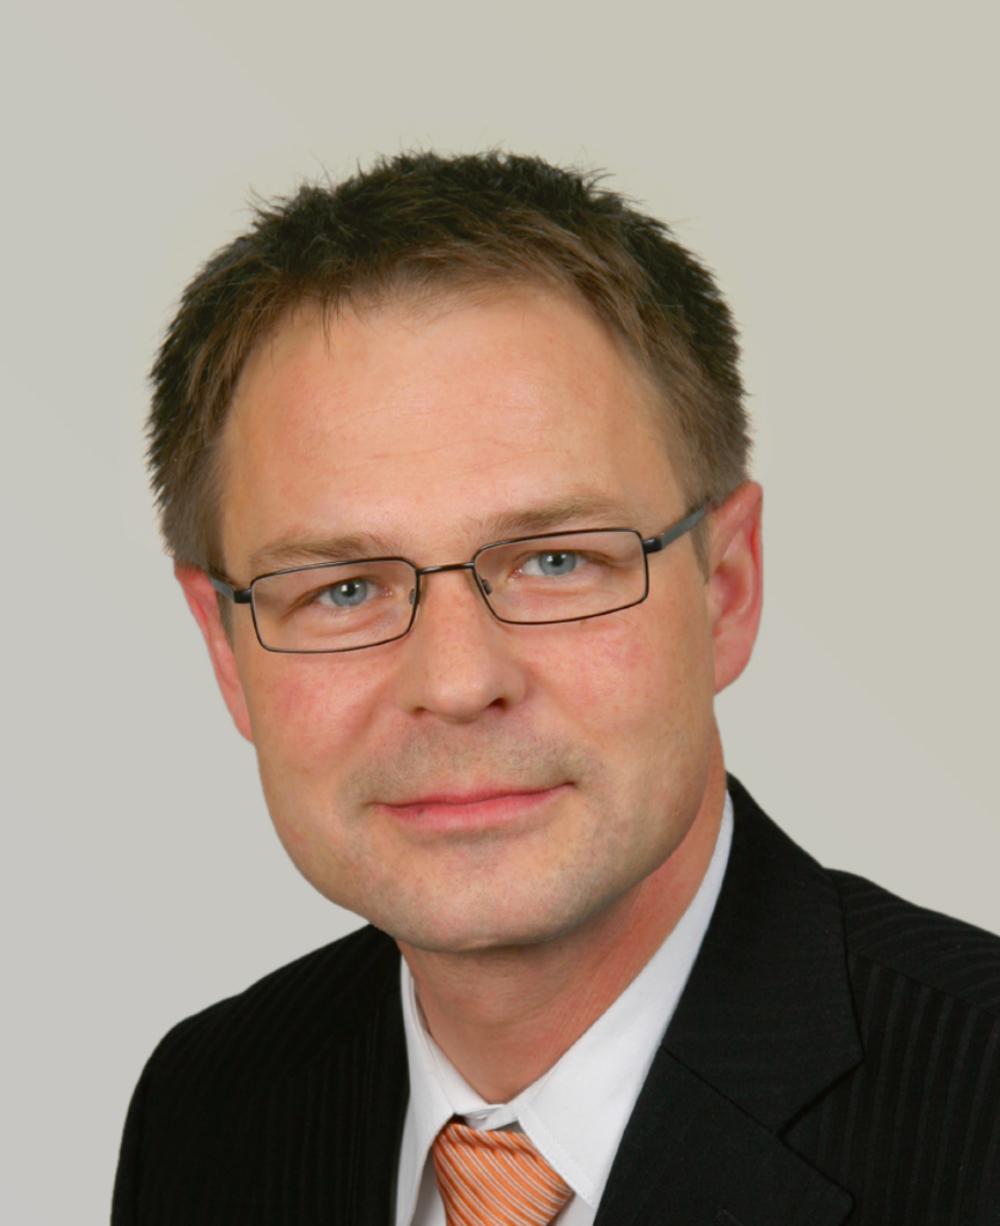 Olaf-Seeger